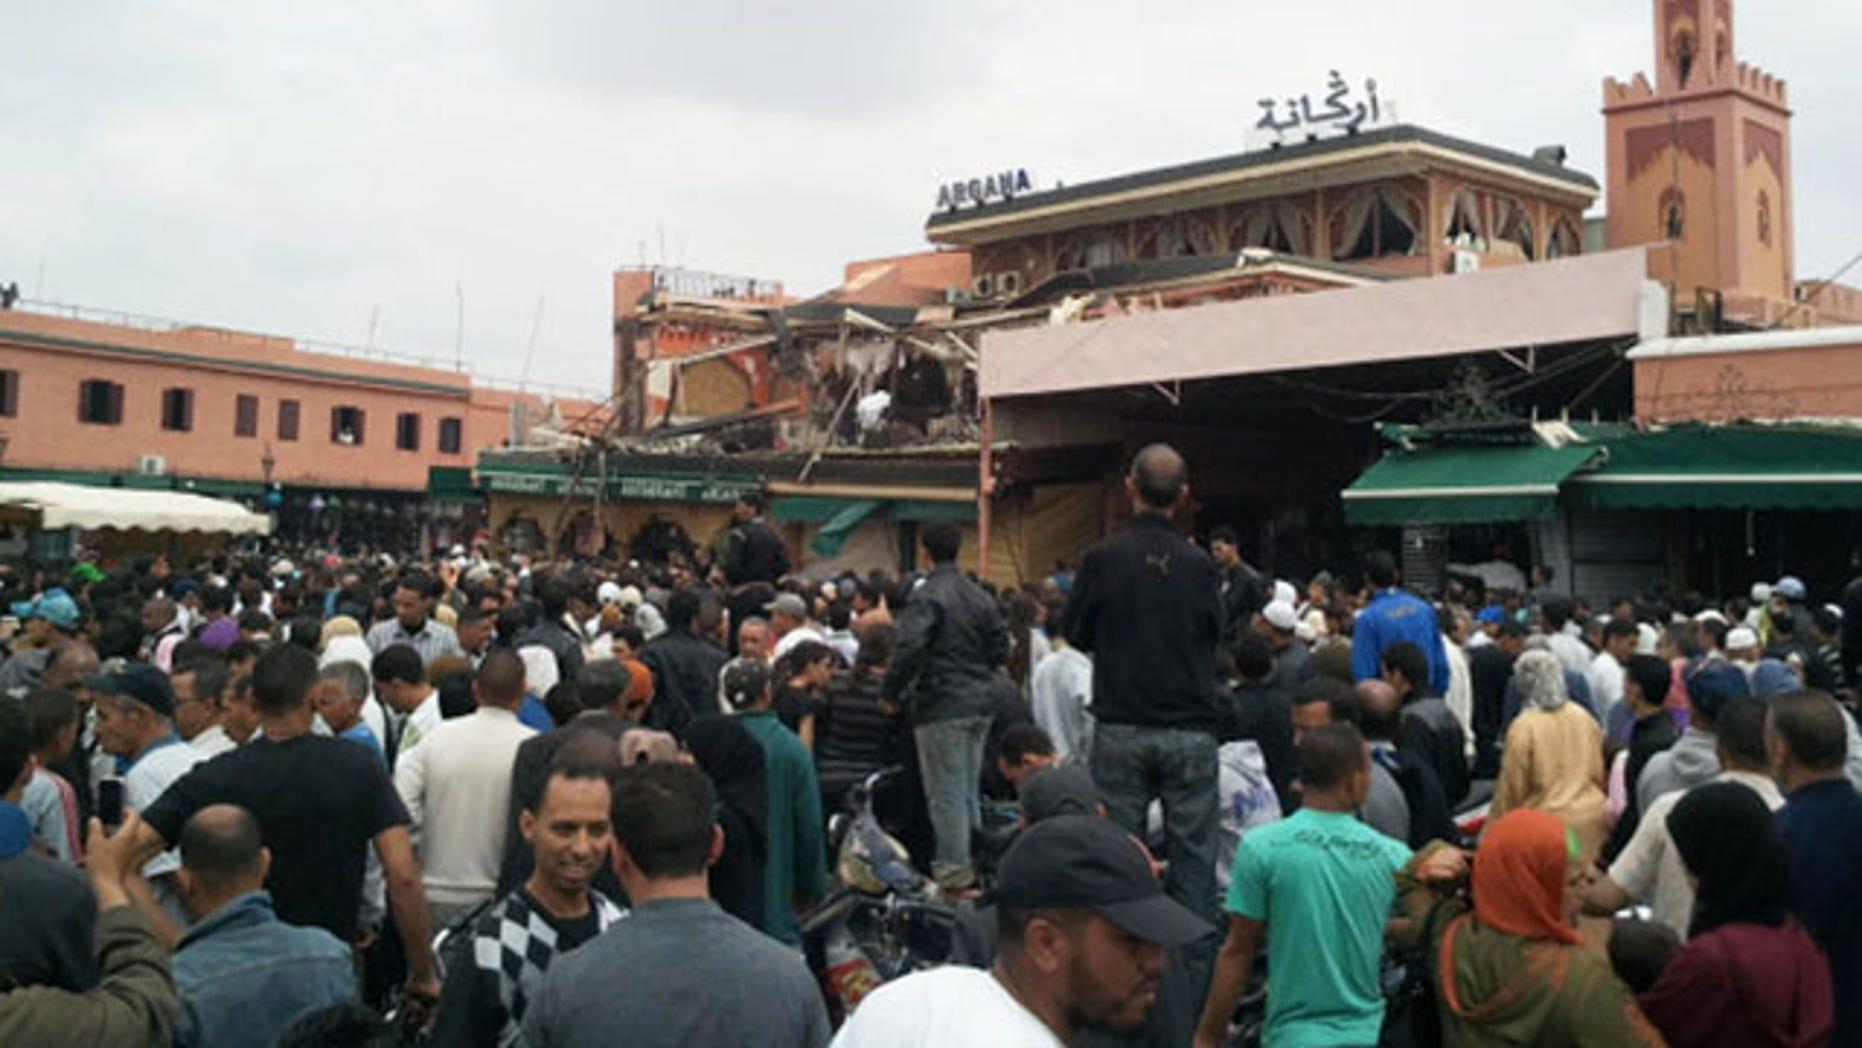 April 28: A crowd congregates outside a cafe in Marrakech. Morocco.